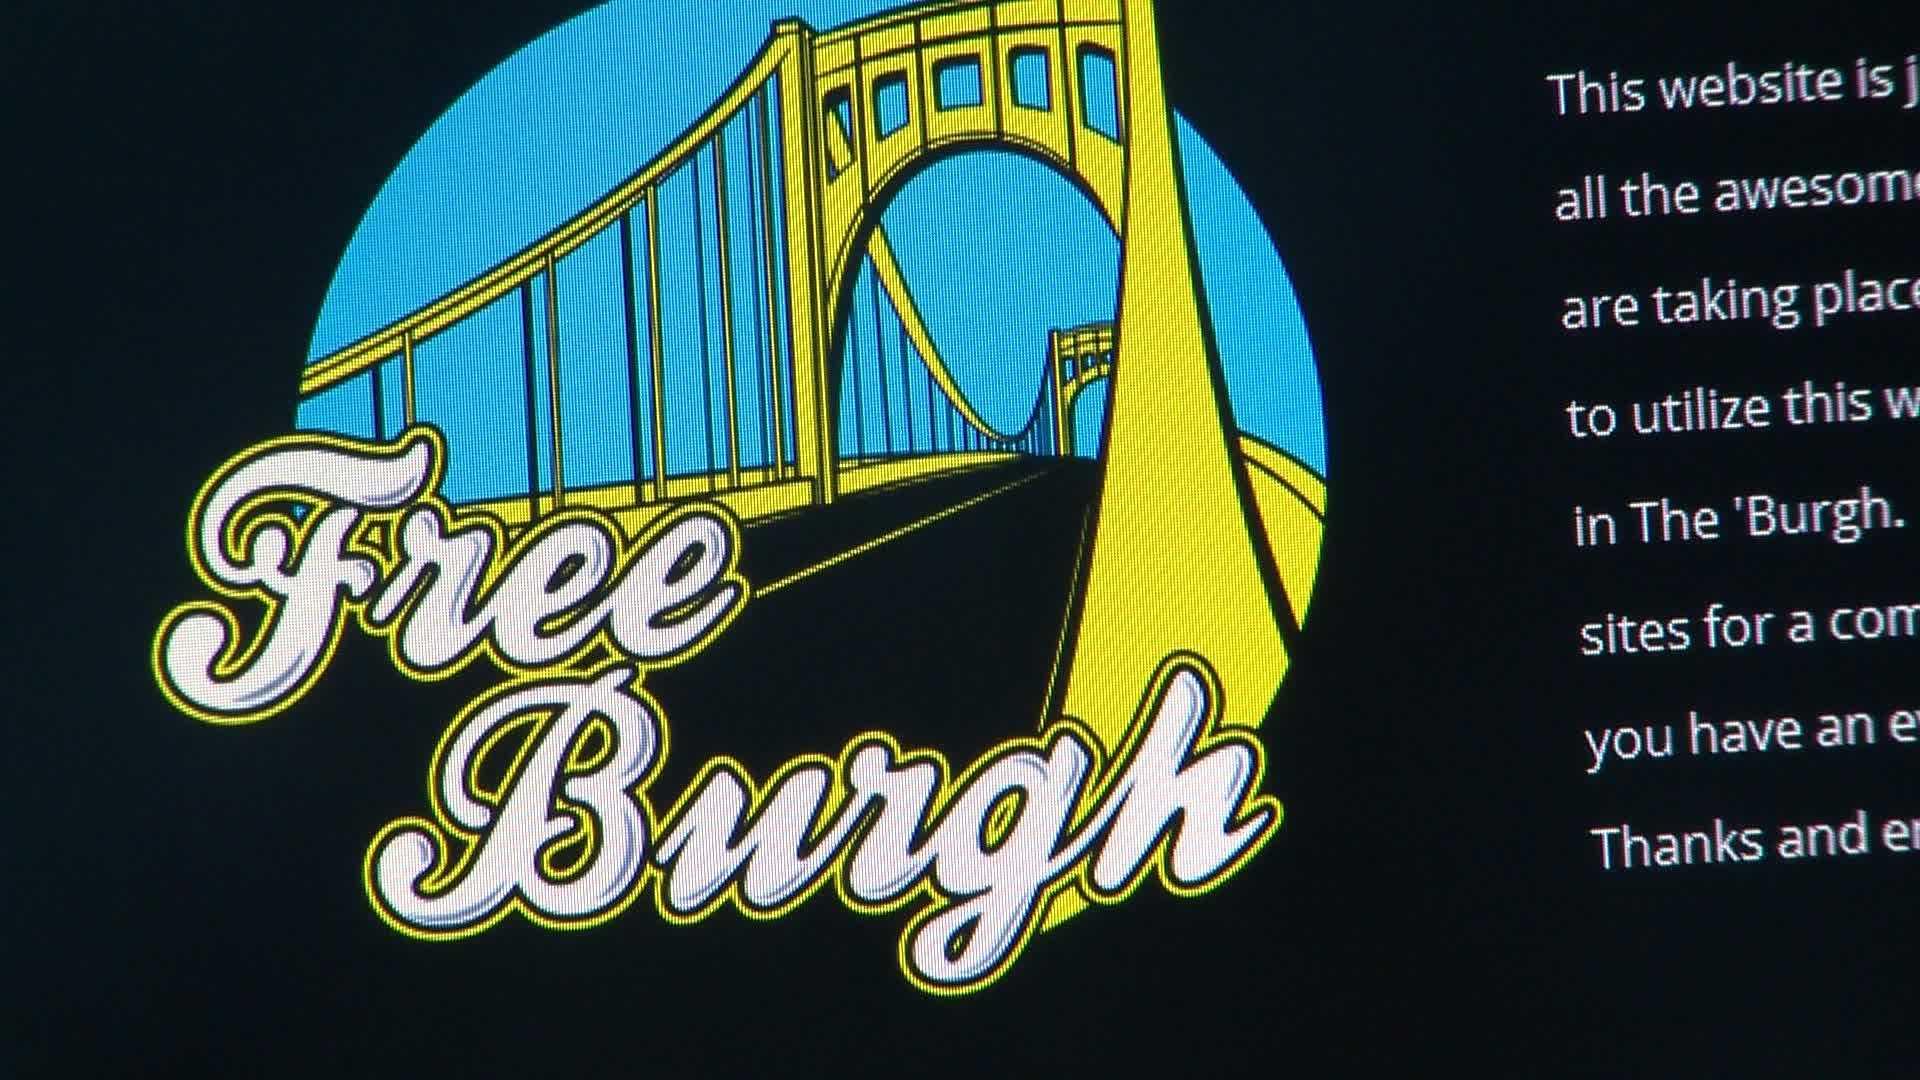 FreeBurgh